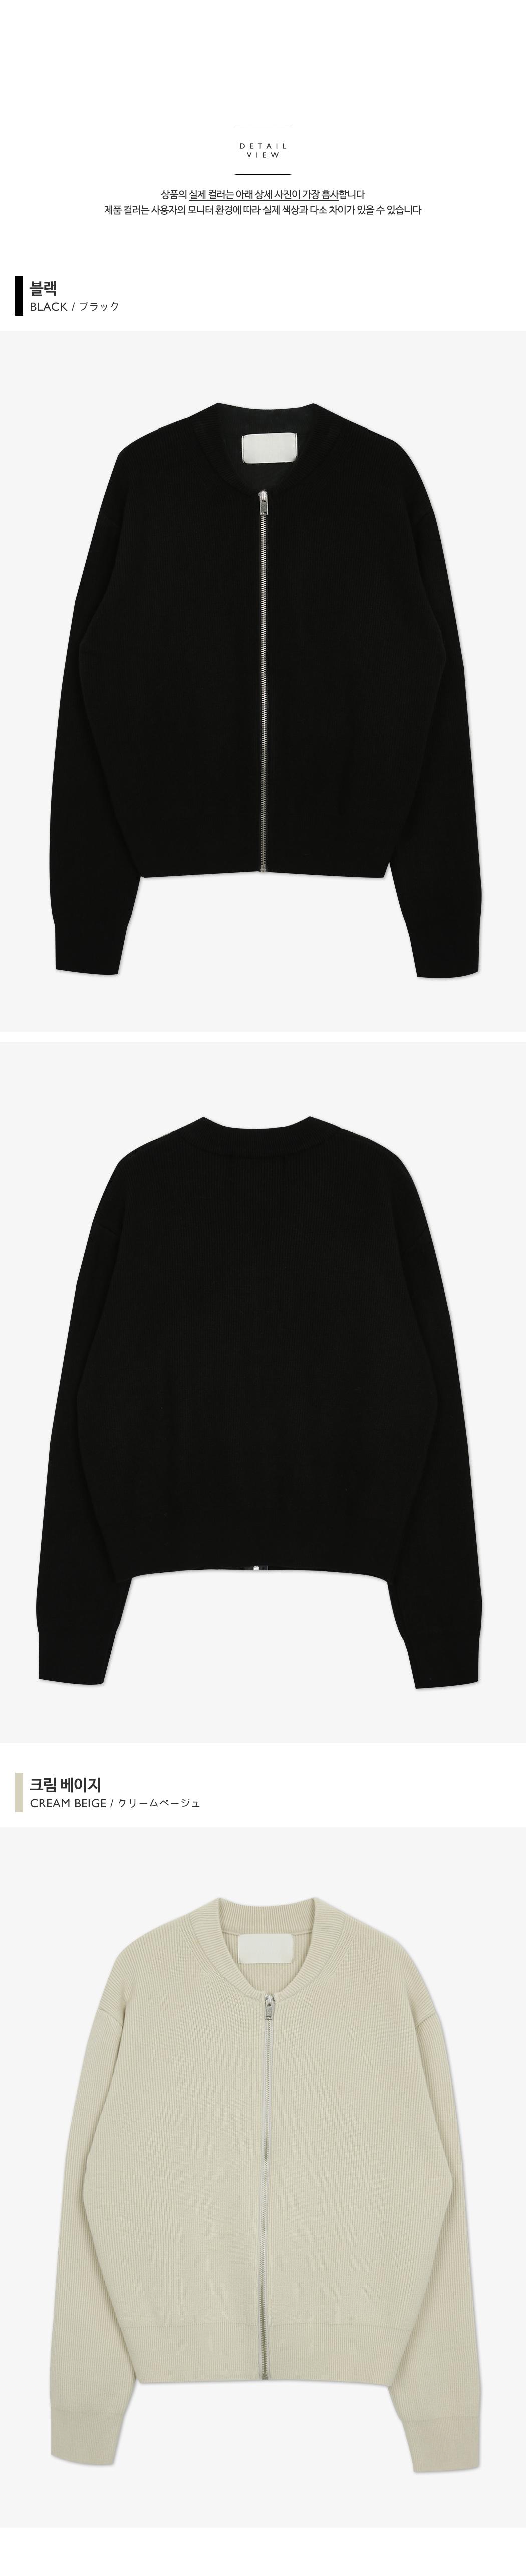 Coz soft knit blouson